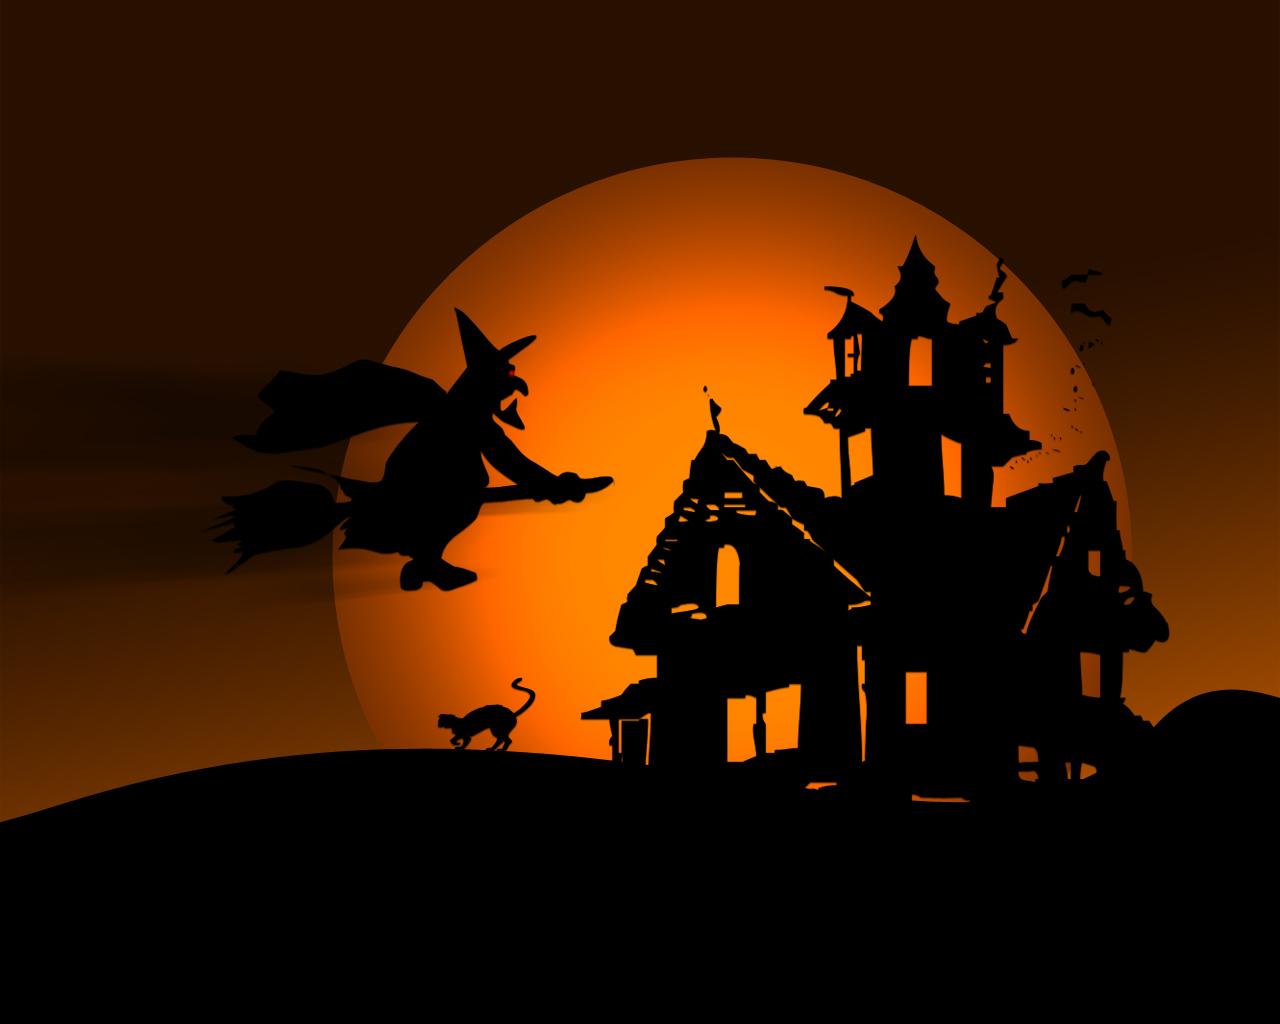 halloweenwallpaperhalloween wallpaper 4809jpg 1280x1024